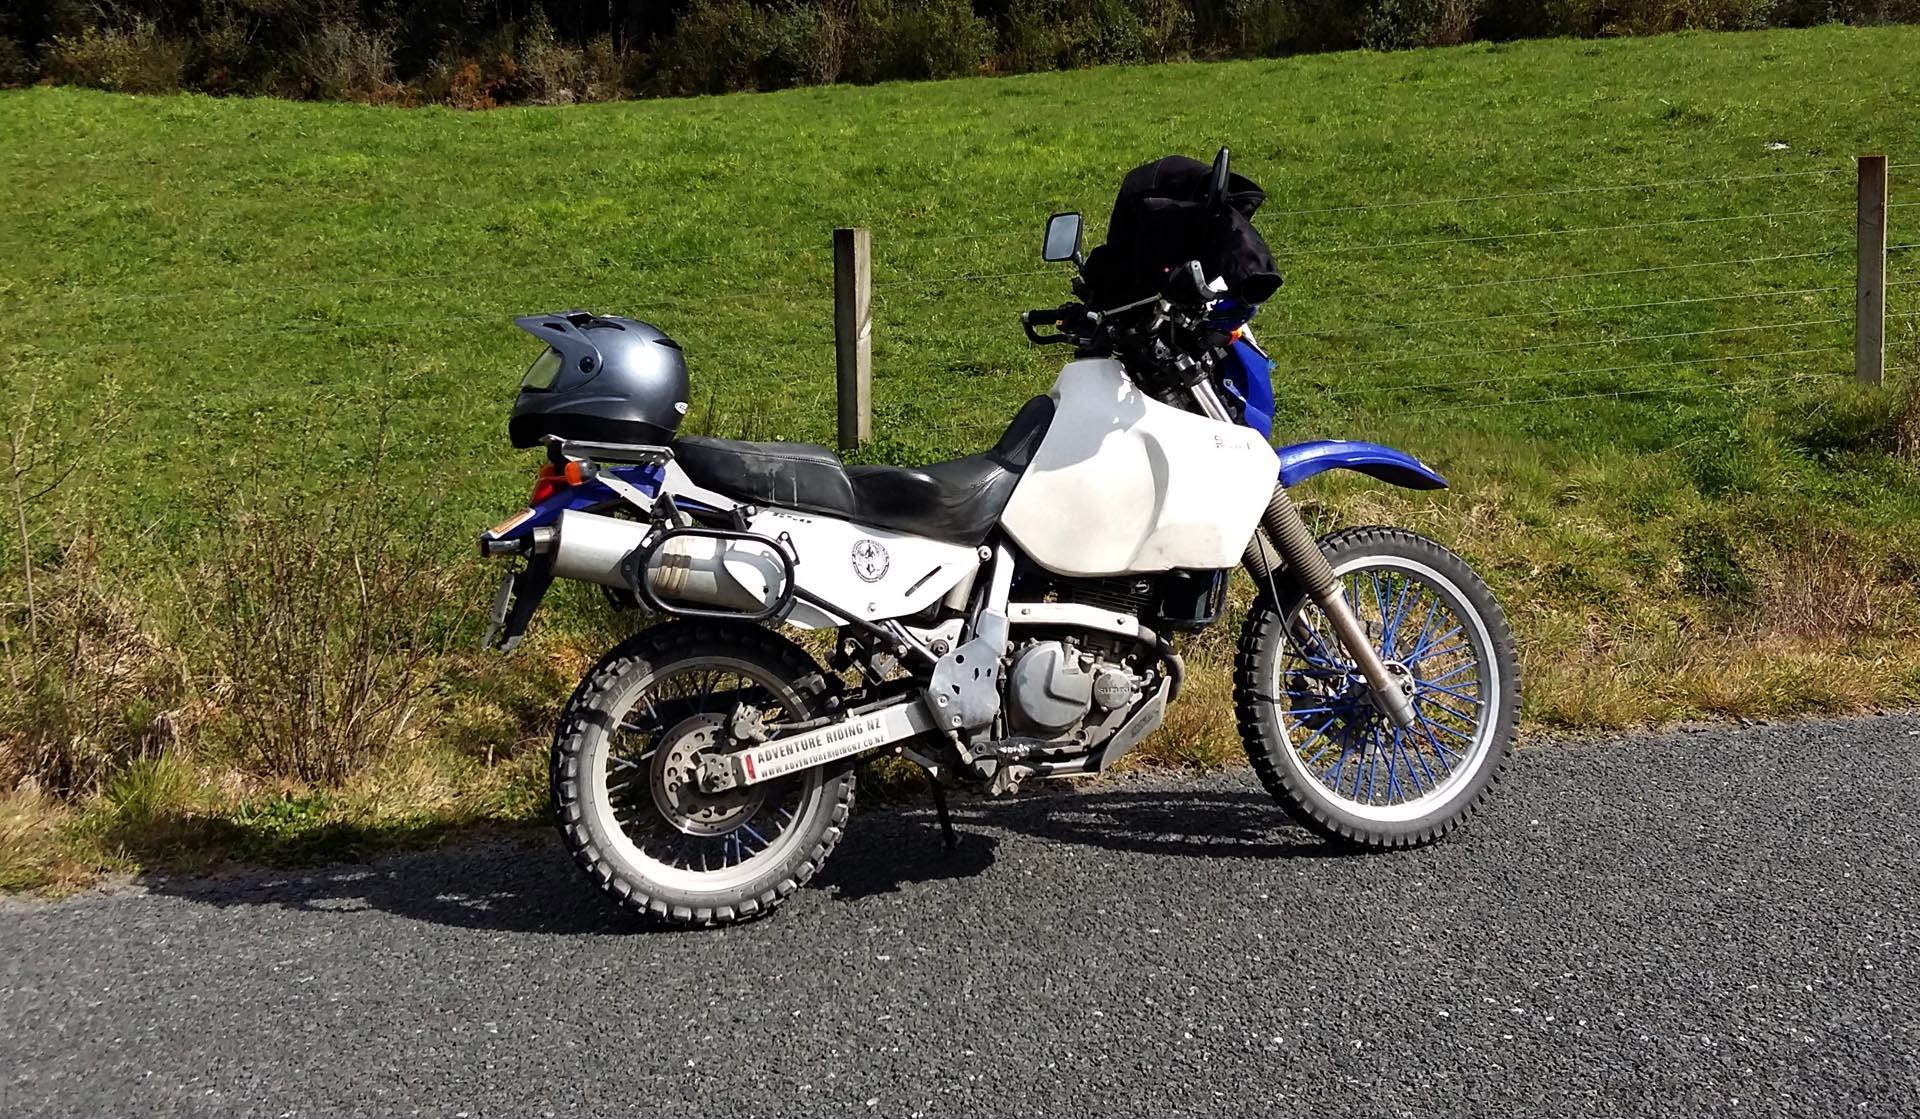 Topic: Suzuki DR650 NZ's top selling ADV bike, Royal Enfield Himalayan 2nd   Adventure Riding NZ